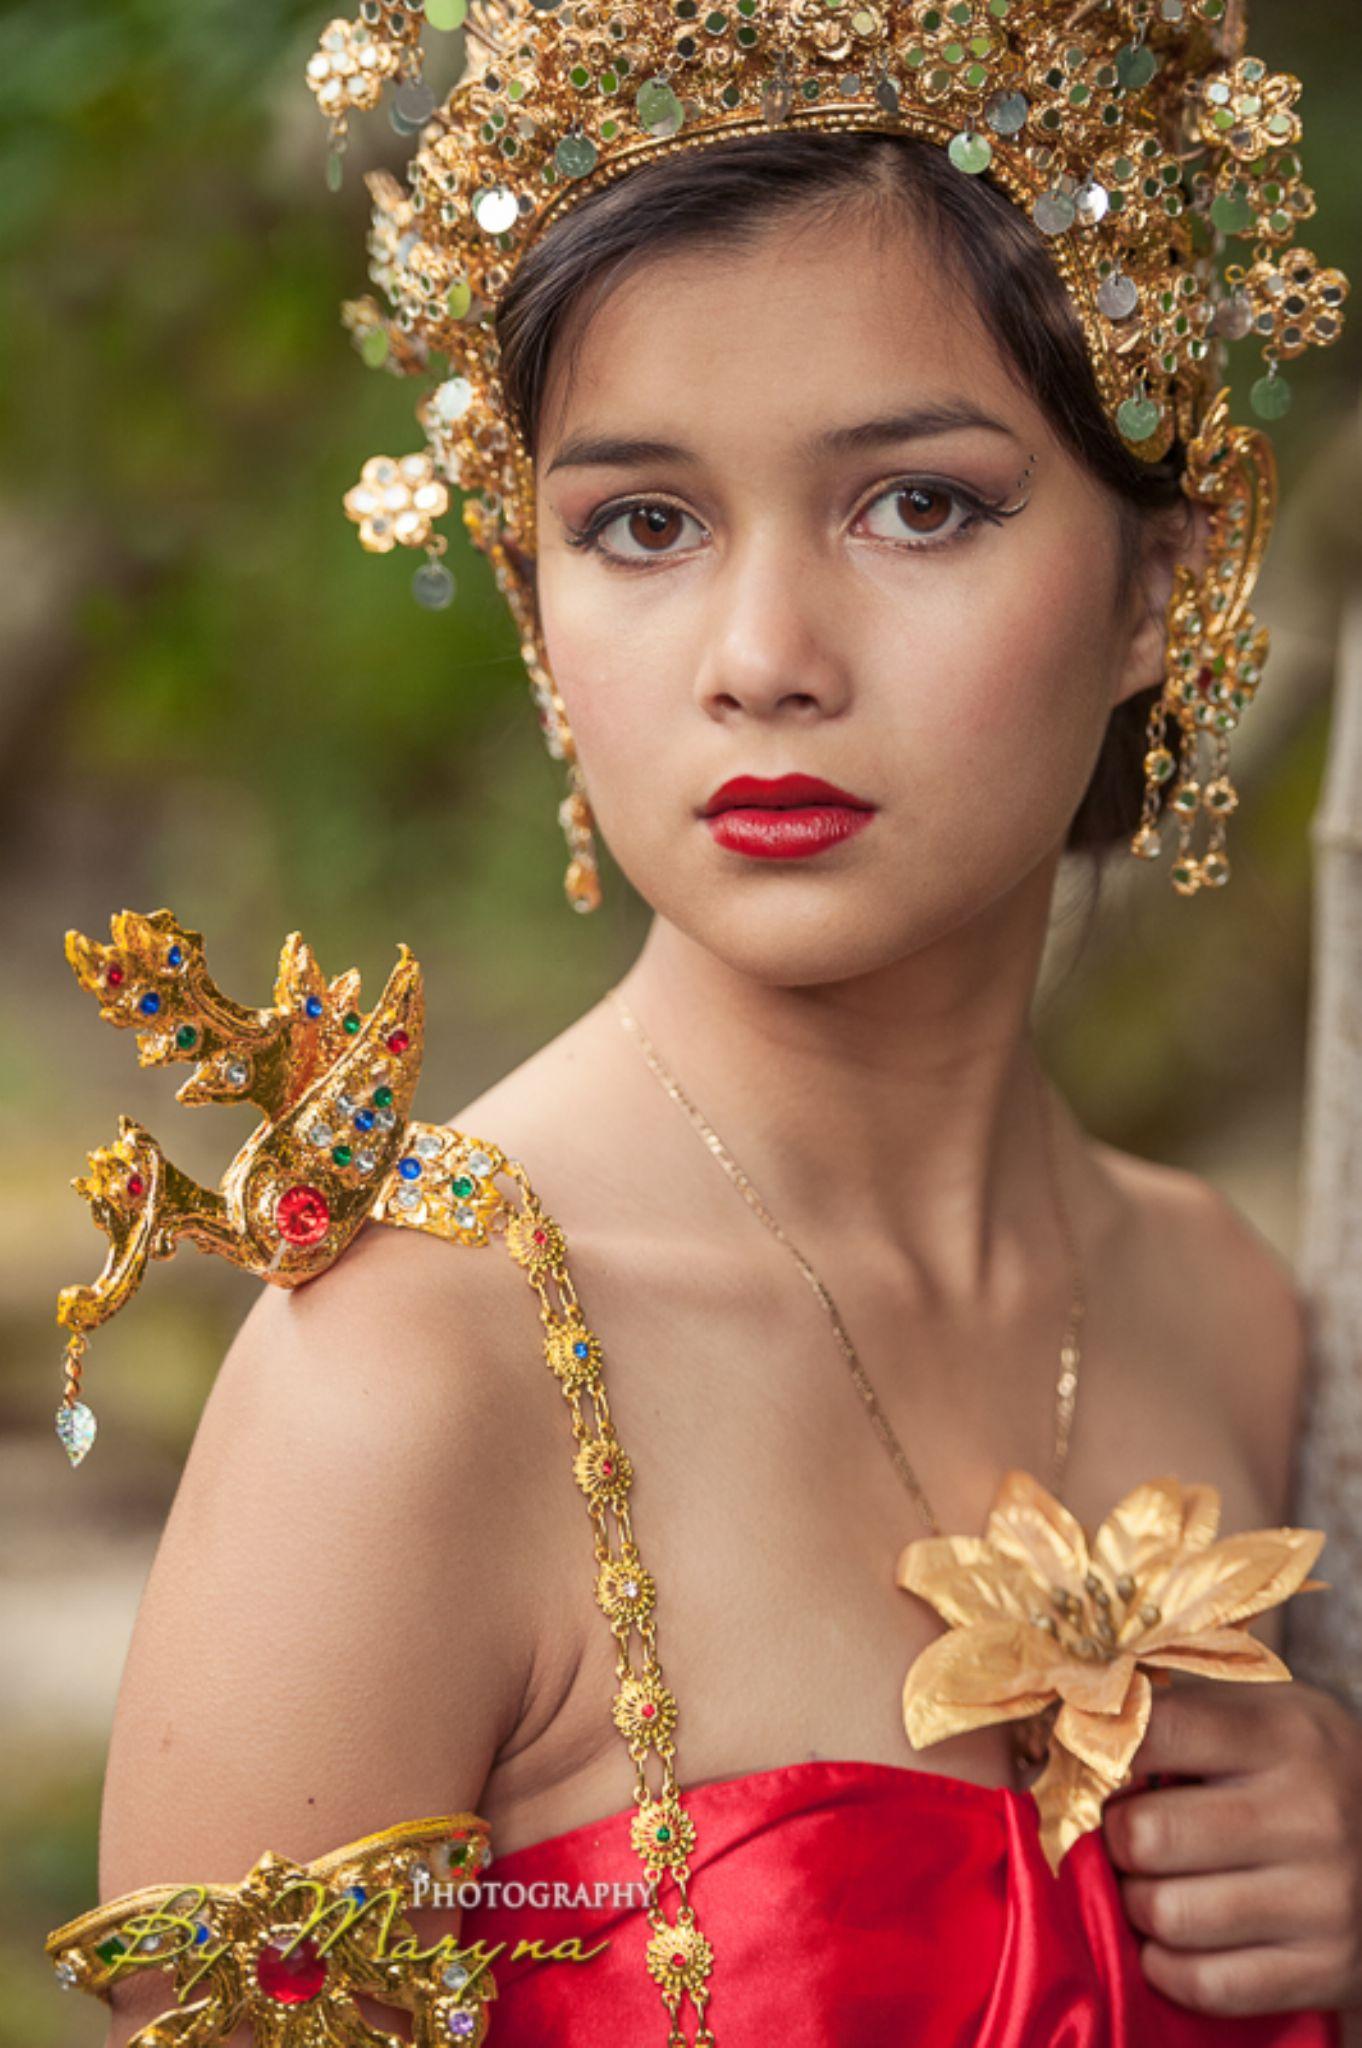 Thai Princess. Model: Suki Fisher by Maryna Halton